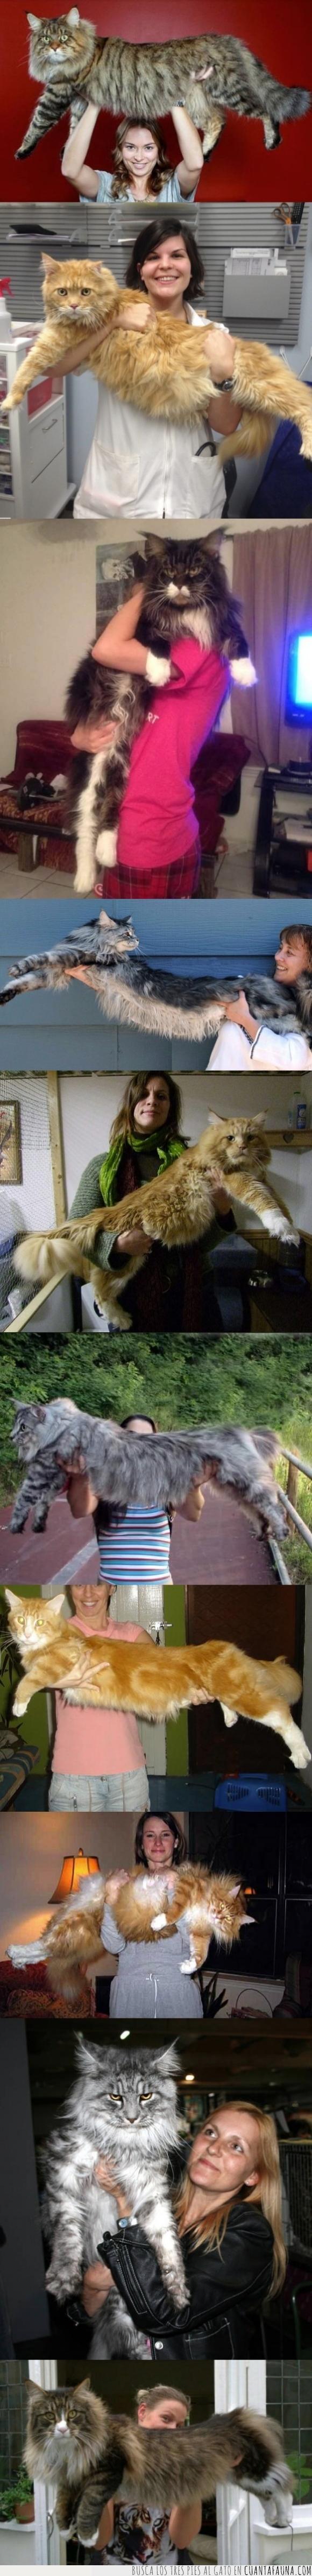 gato,gigante,grande,Maine coon,tamaño